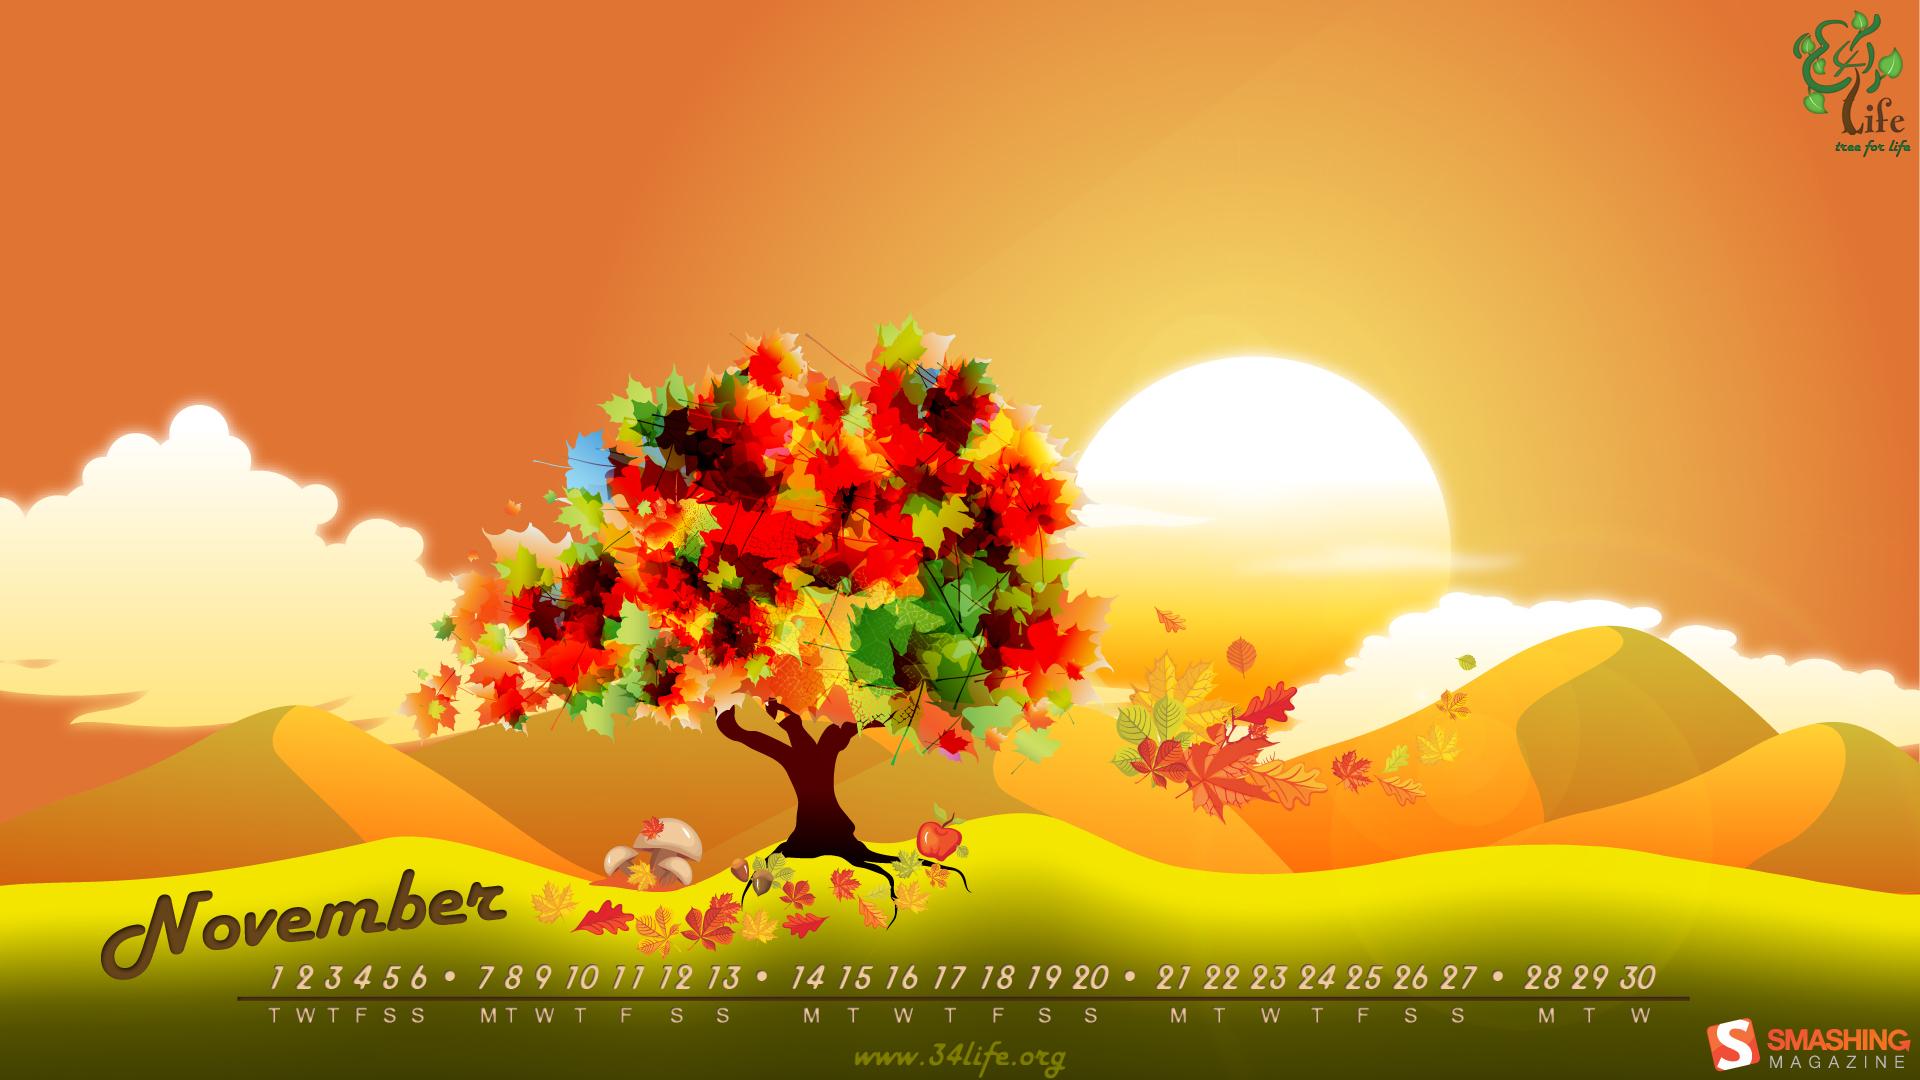 November Wallpaper Desktop HD wallpaper background 1920x1080